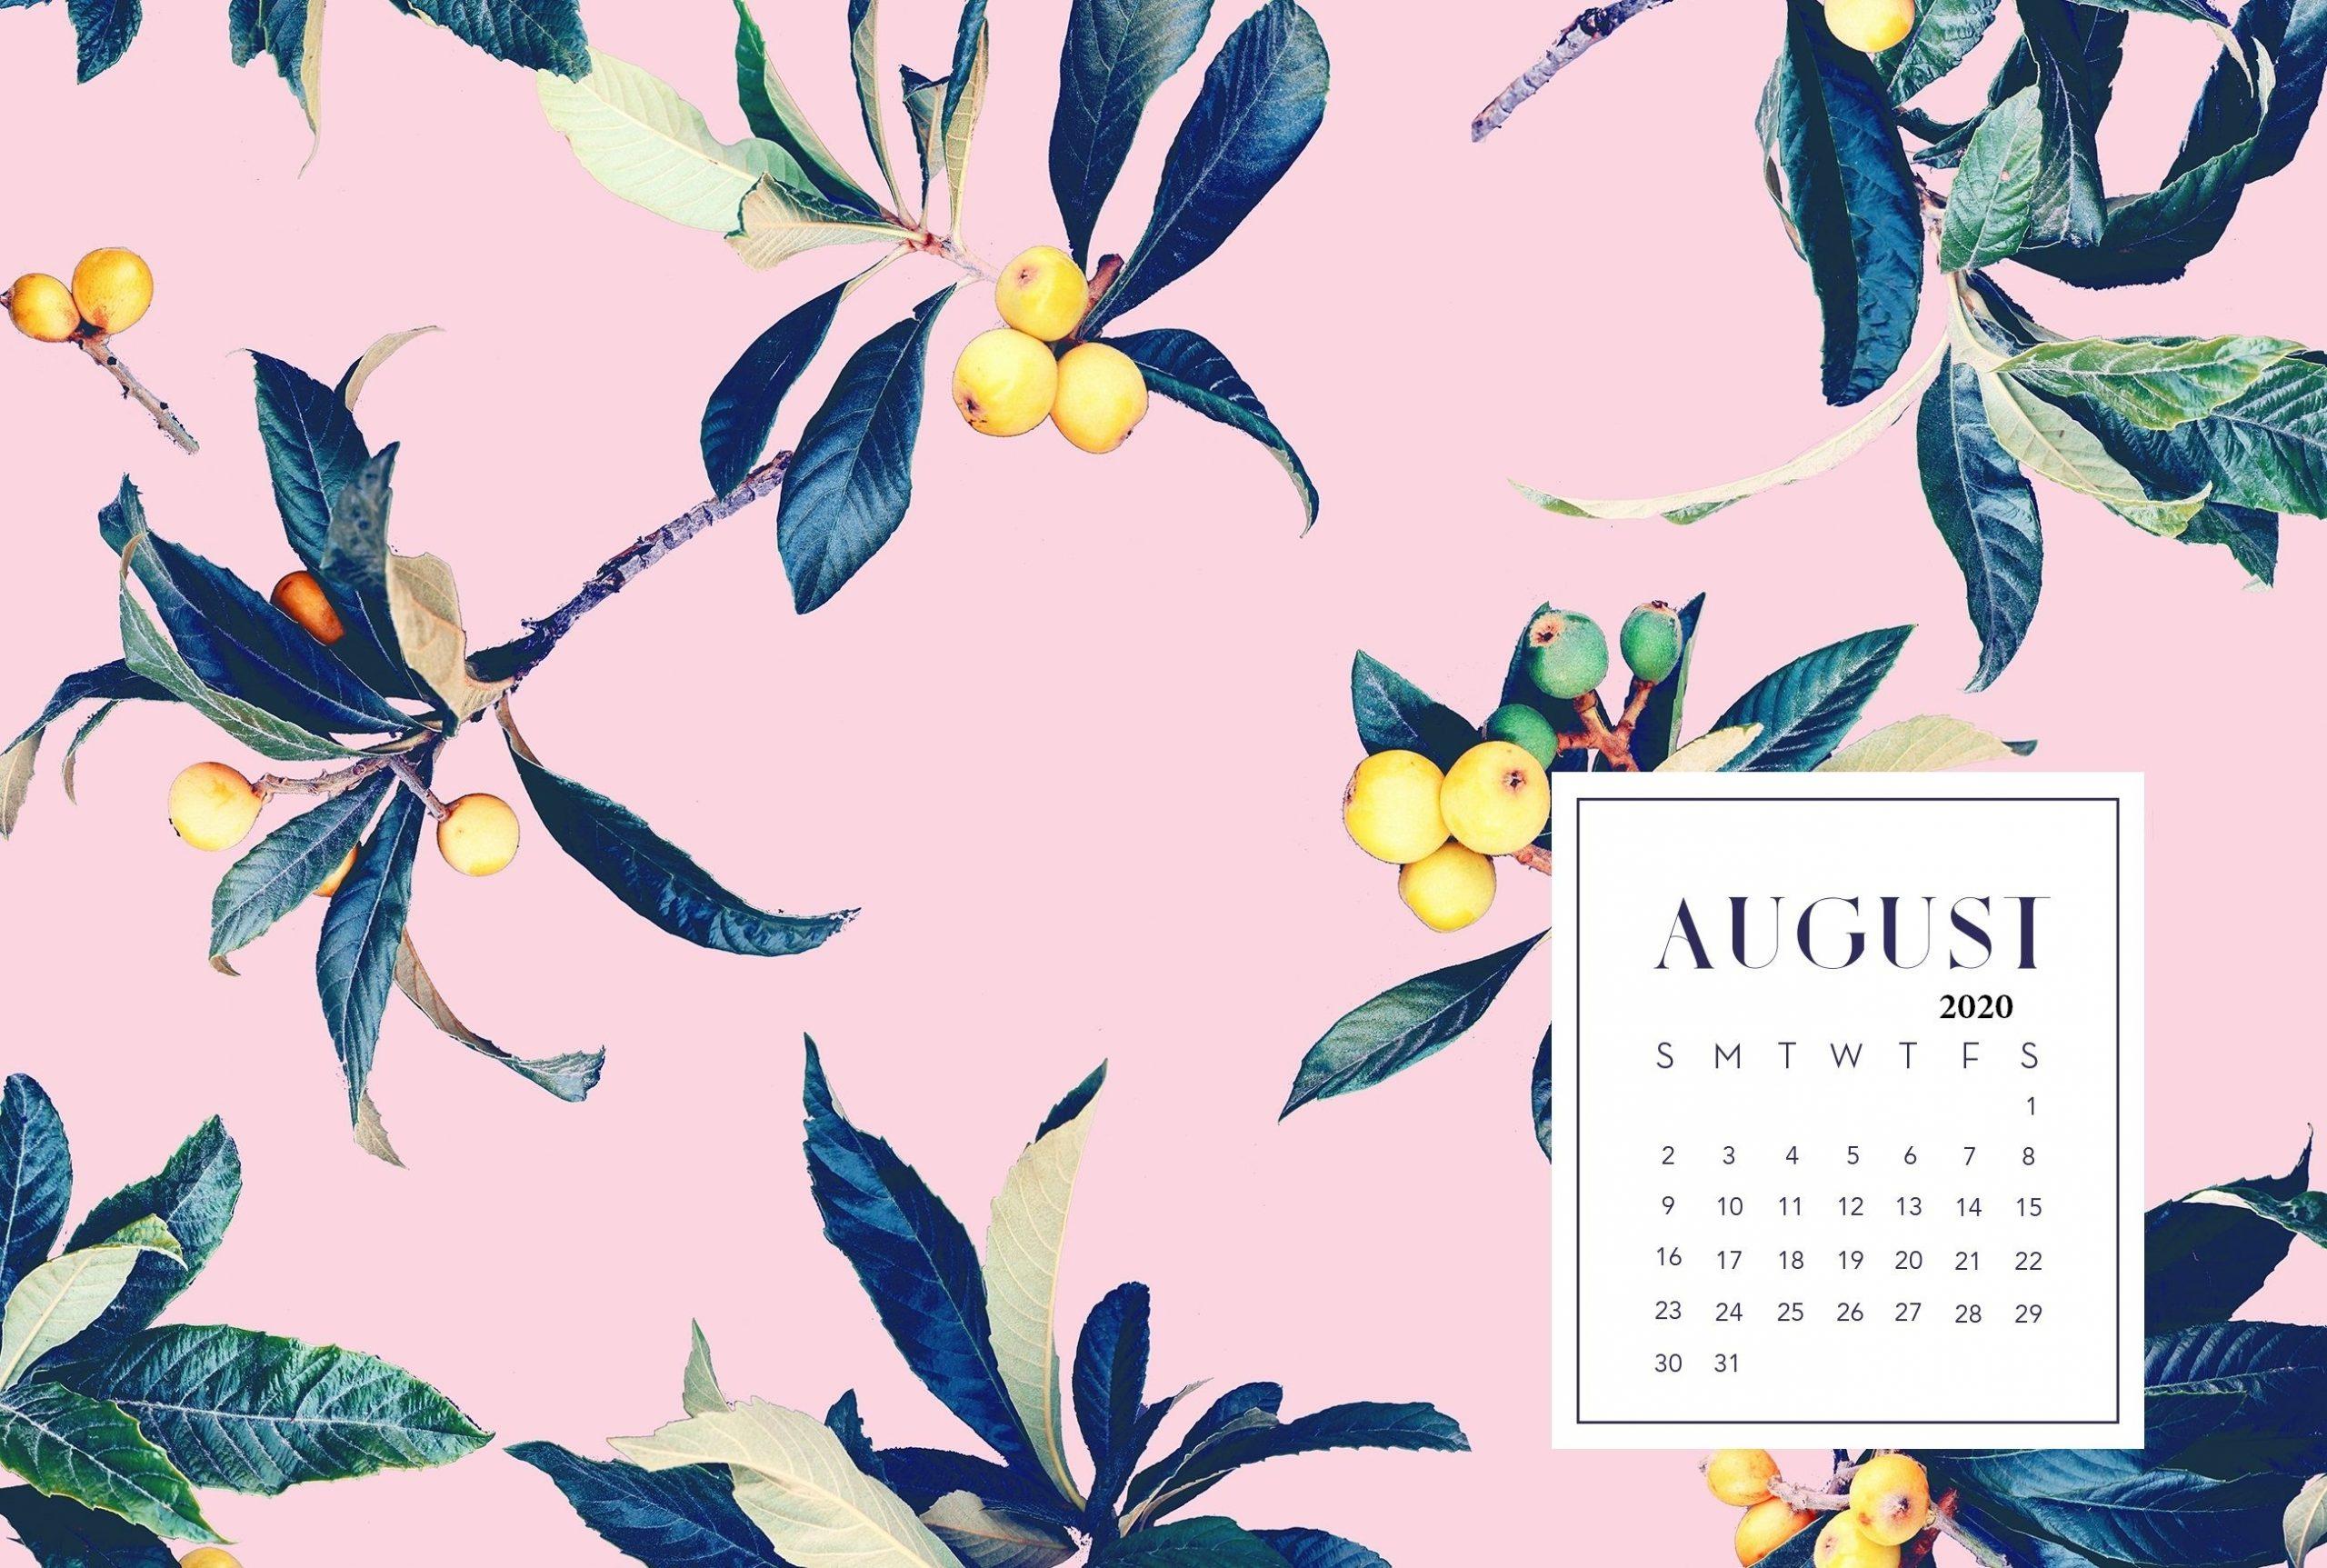 Catch Funny August 2021 Desktop Calendar